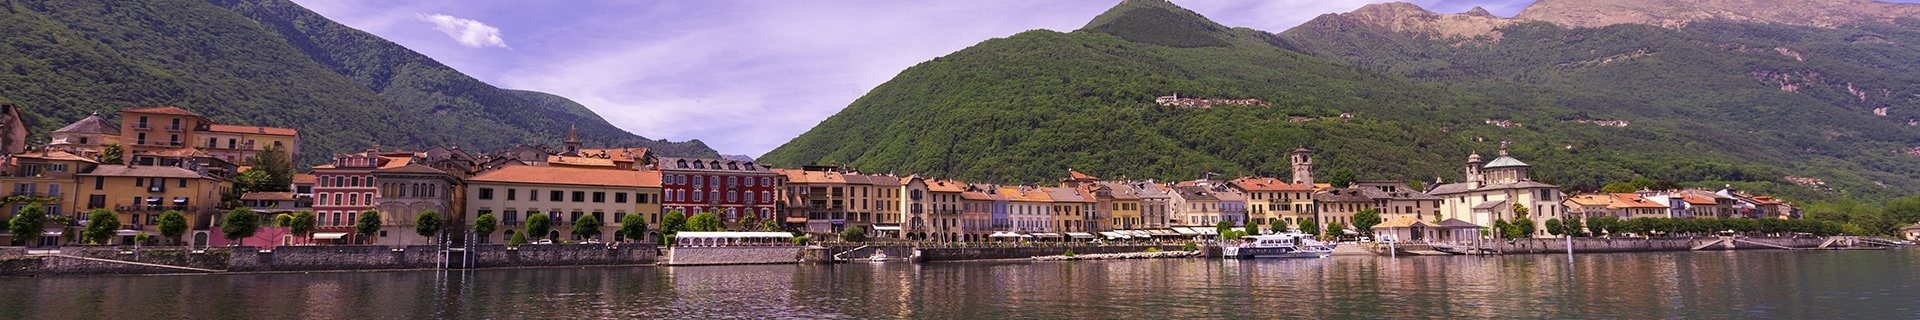 Travelling through undiscovered Piedmont